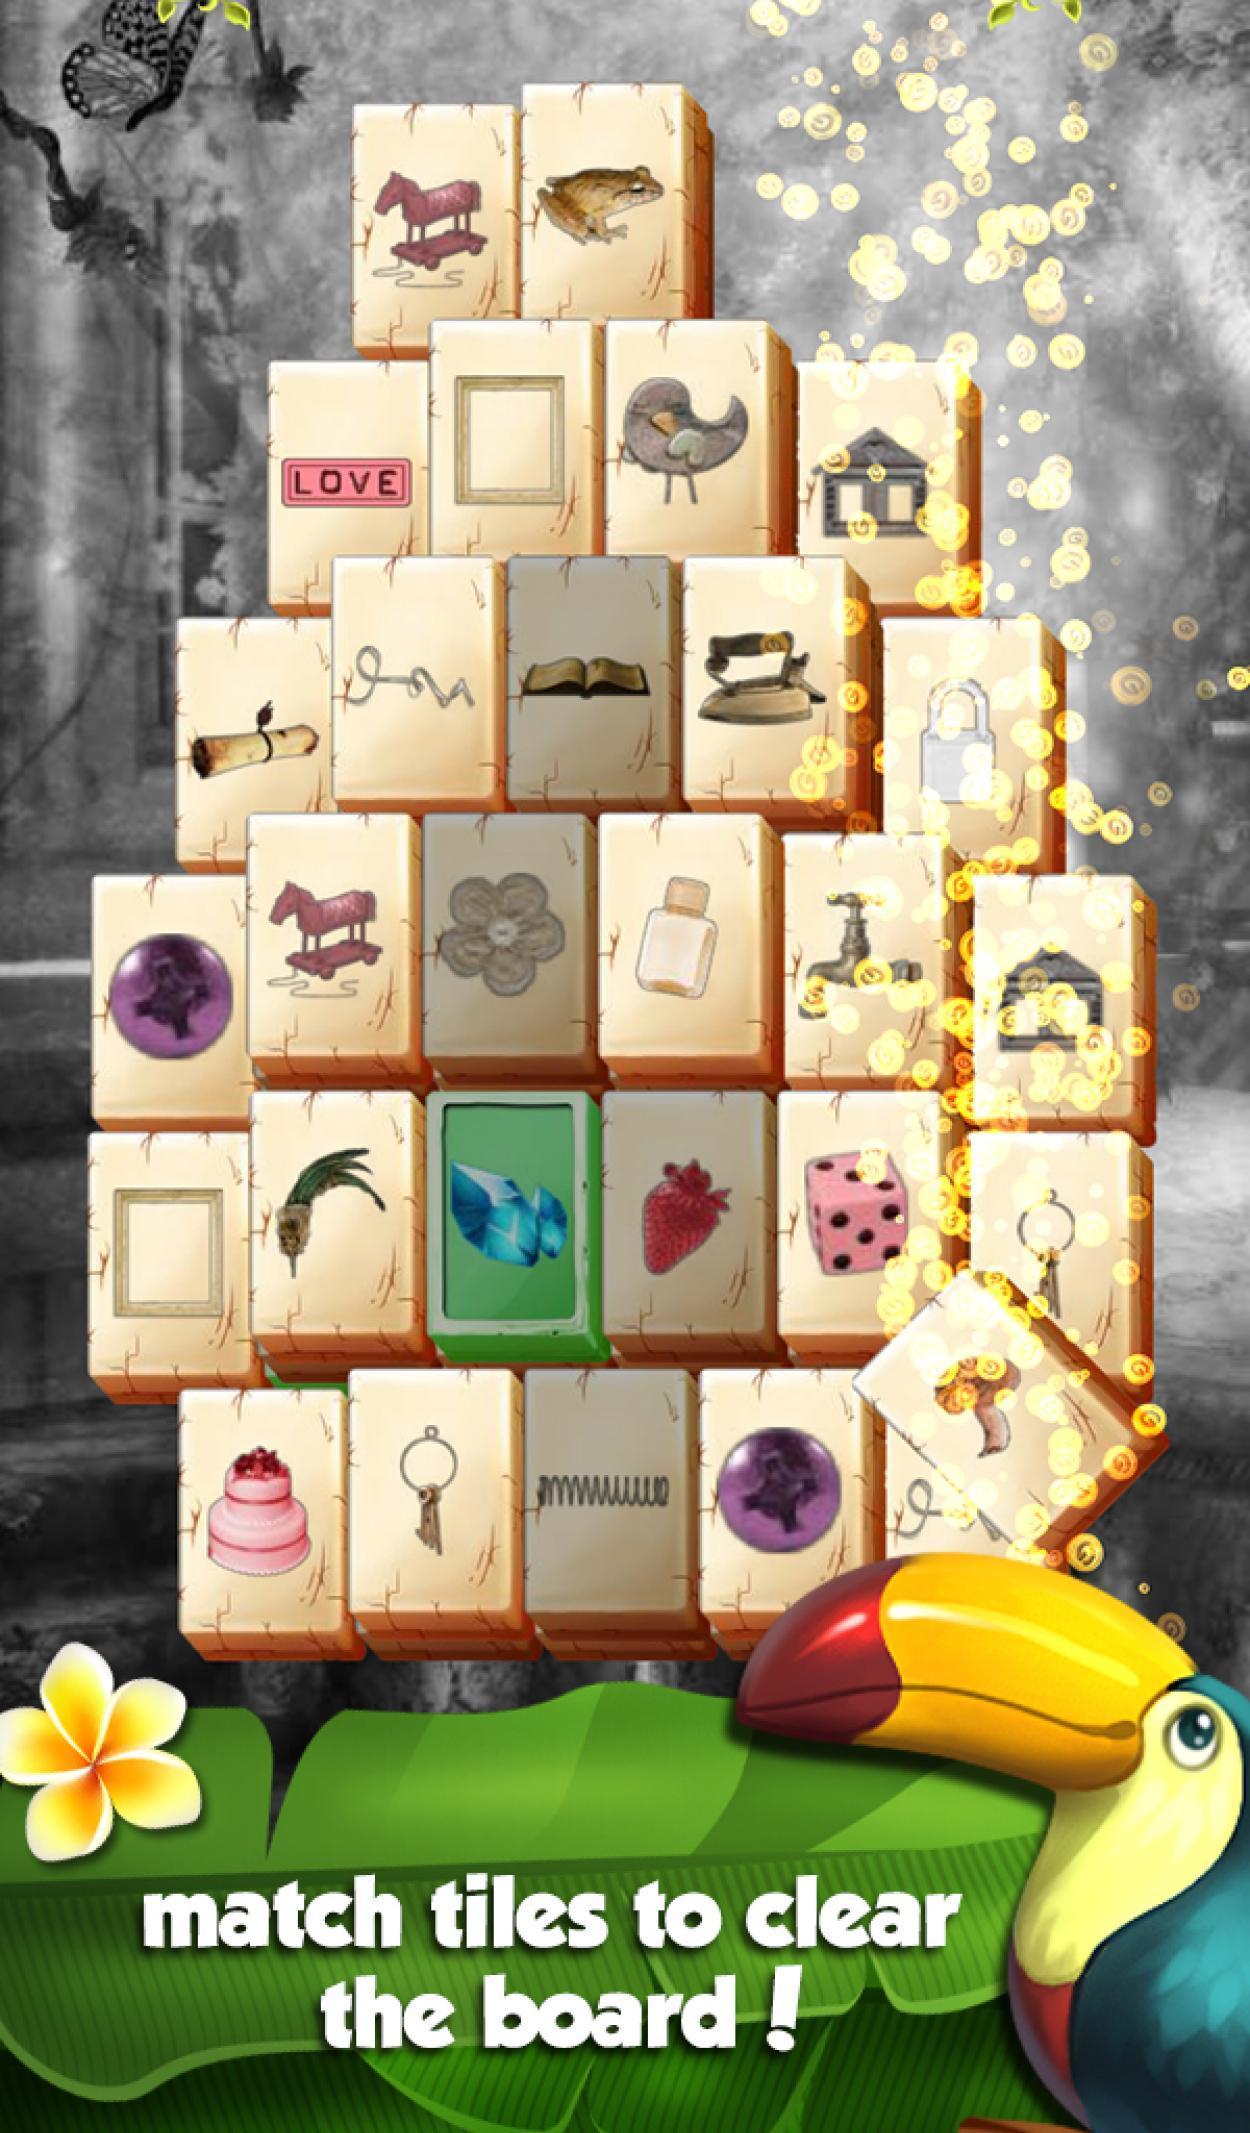 Mahjong World Adventure - The Treasure Trails 1.0.30 Screenshot 23